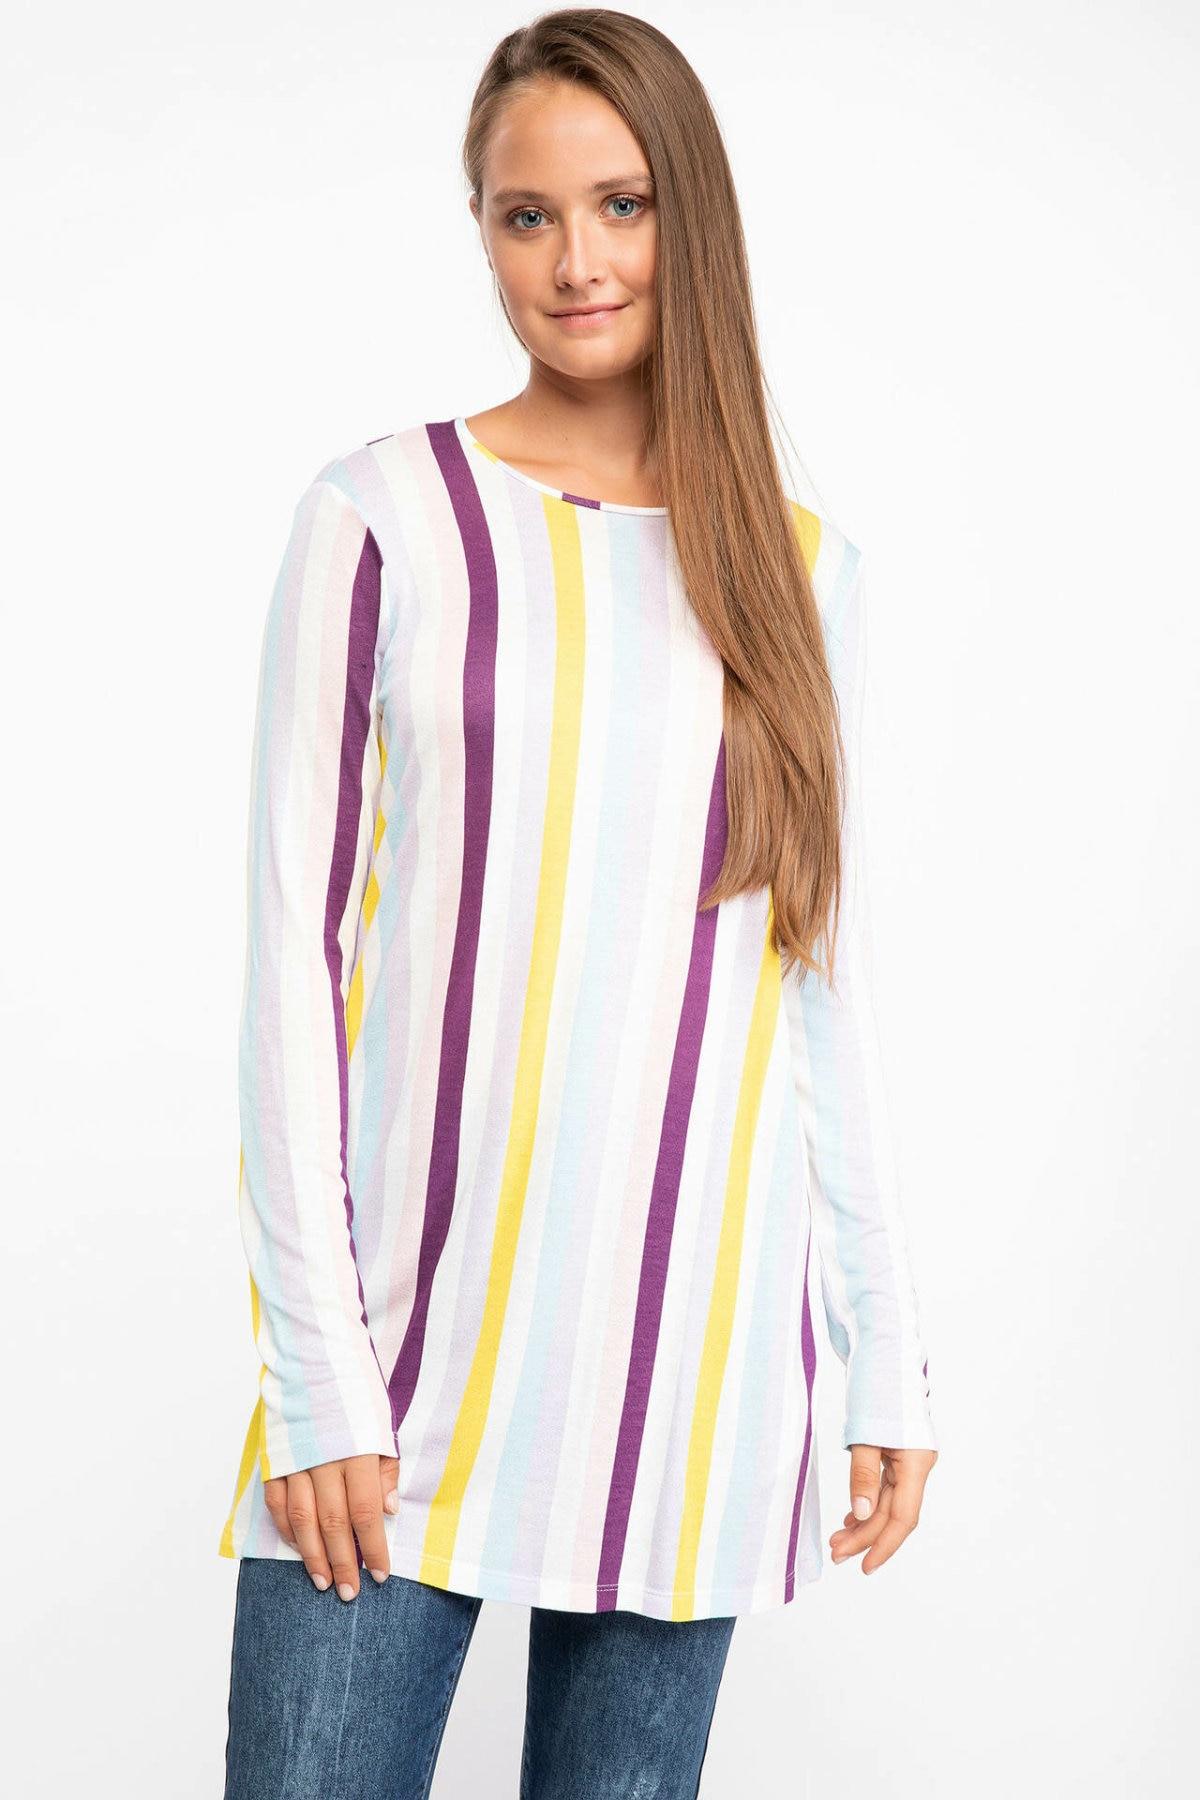 DeFacto Woman White Knitted Colorful Tunic Tops Women Striped Long Top Tees Women Autumn White T-Shirt-J6575AZ18AU